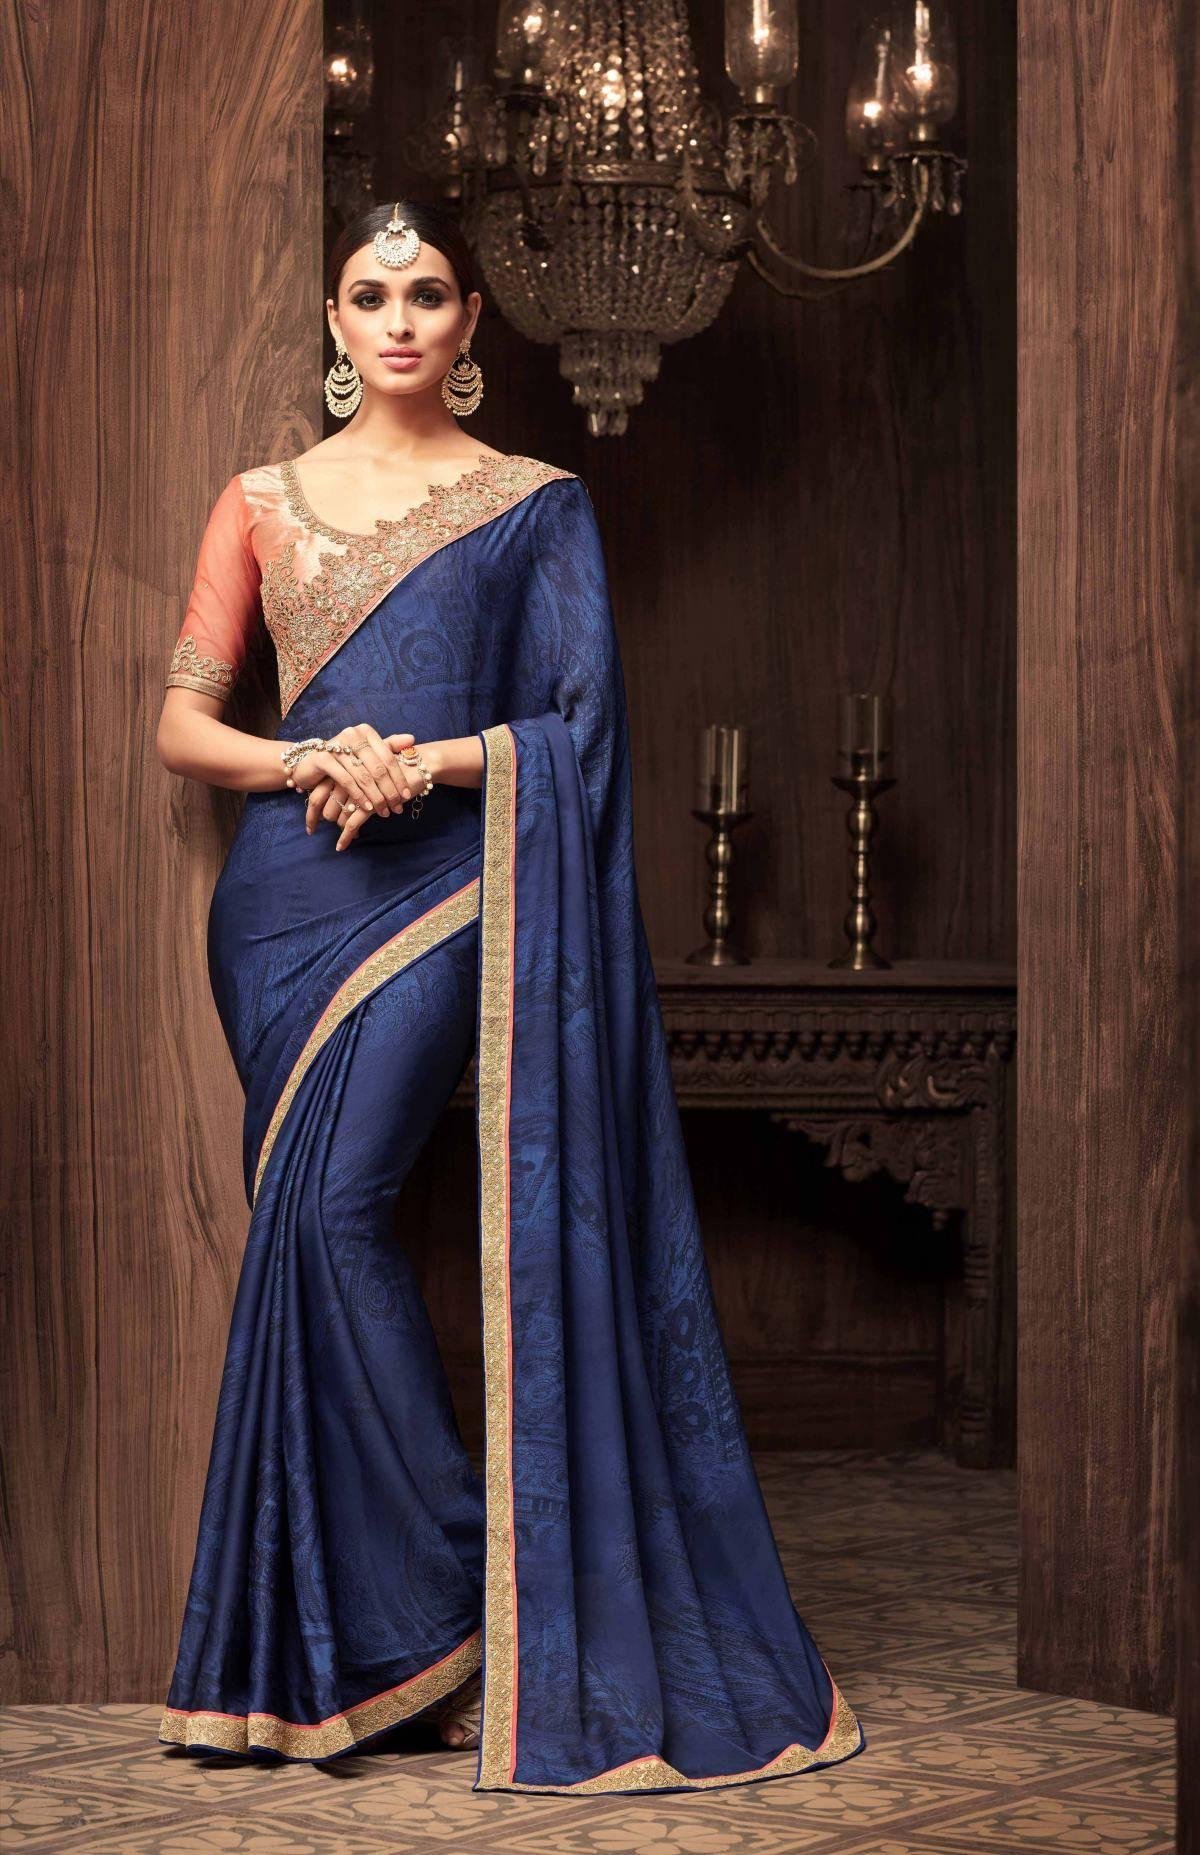 Printed Georgette Saree (sari) in Navyblue